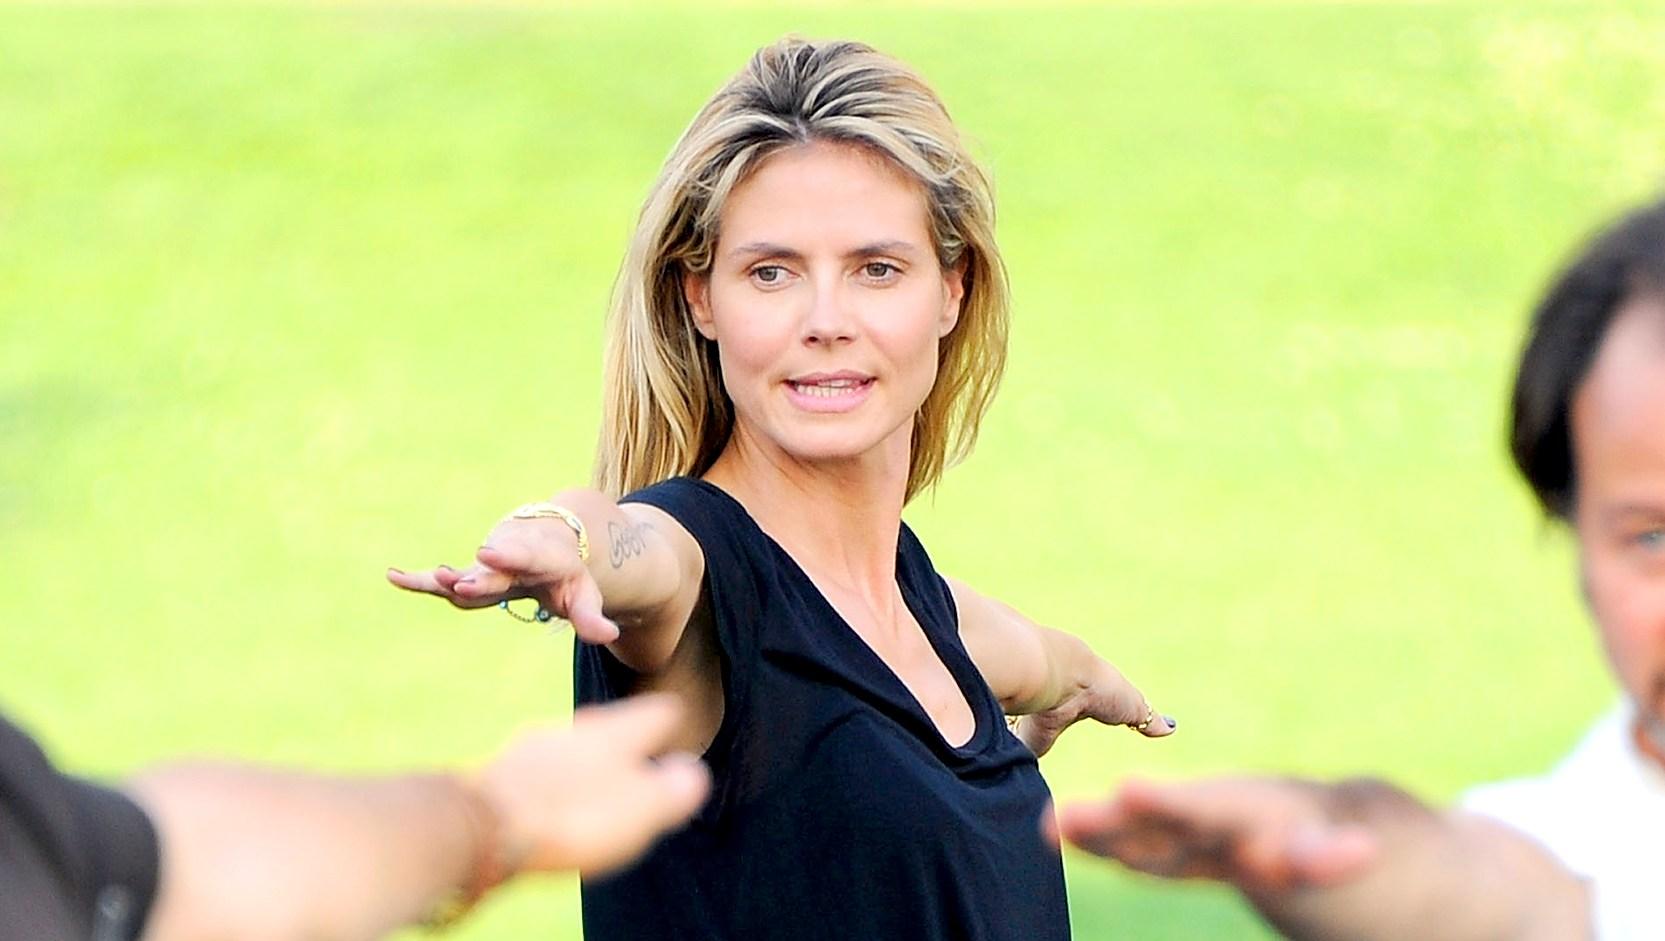 Heidi-Klum-pilates